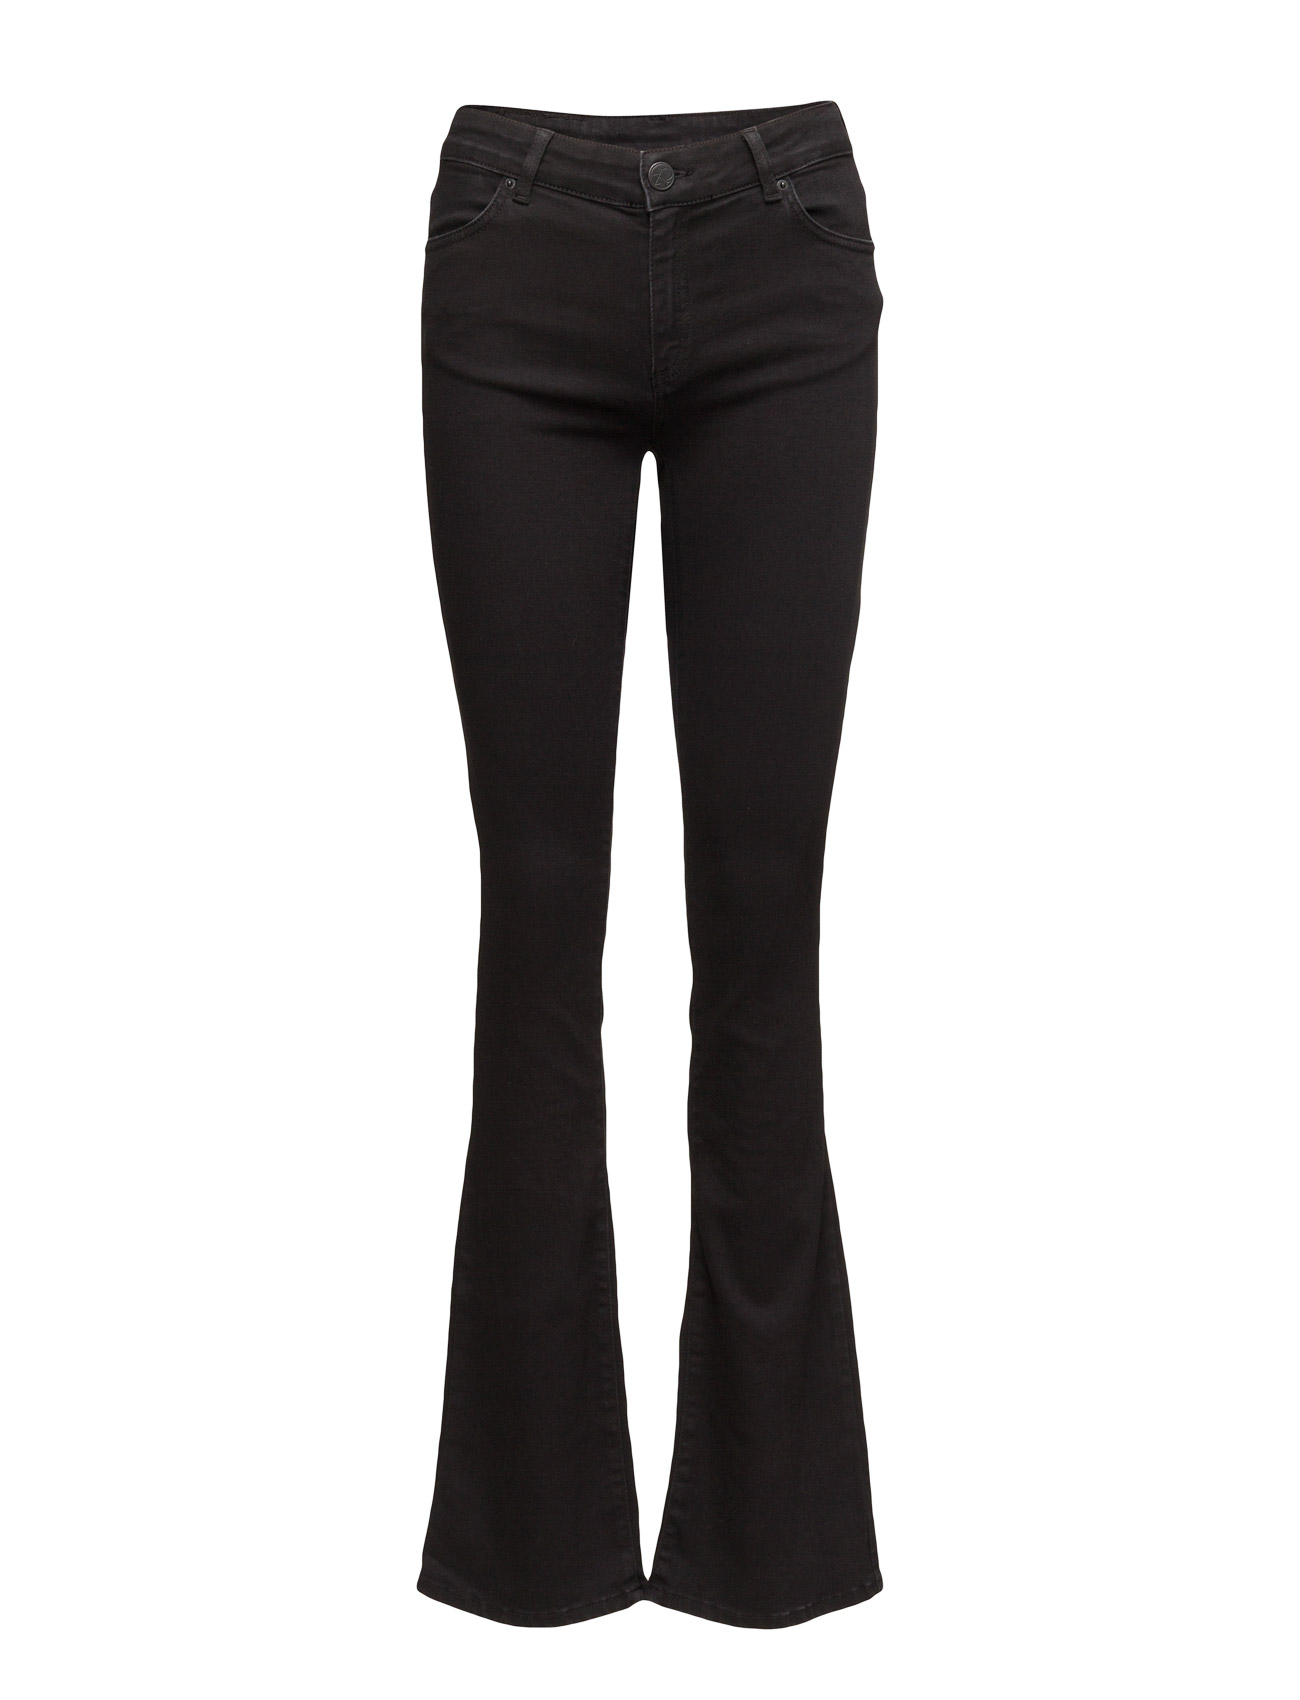 2nd one Uma 002 satin black, jeans (33) fra boozt.com dk